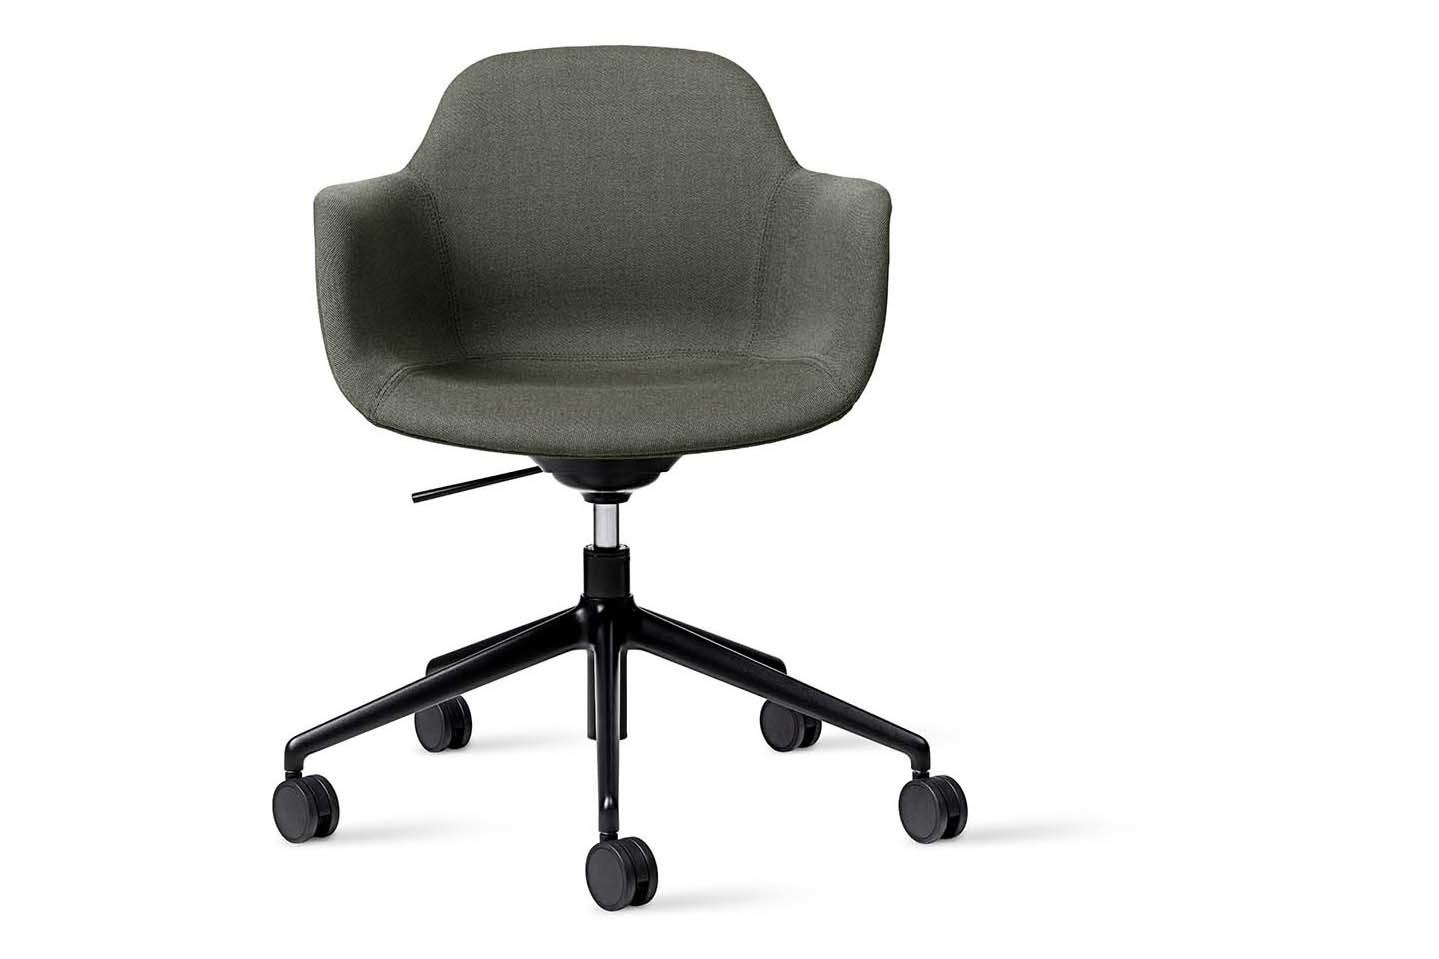 Arena Chair 5 Star Base on Castors Fully Upholstered Pricegrp. 1